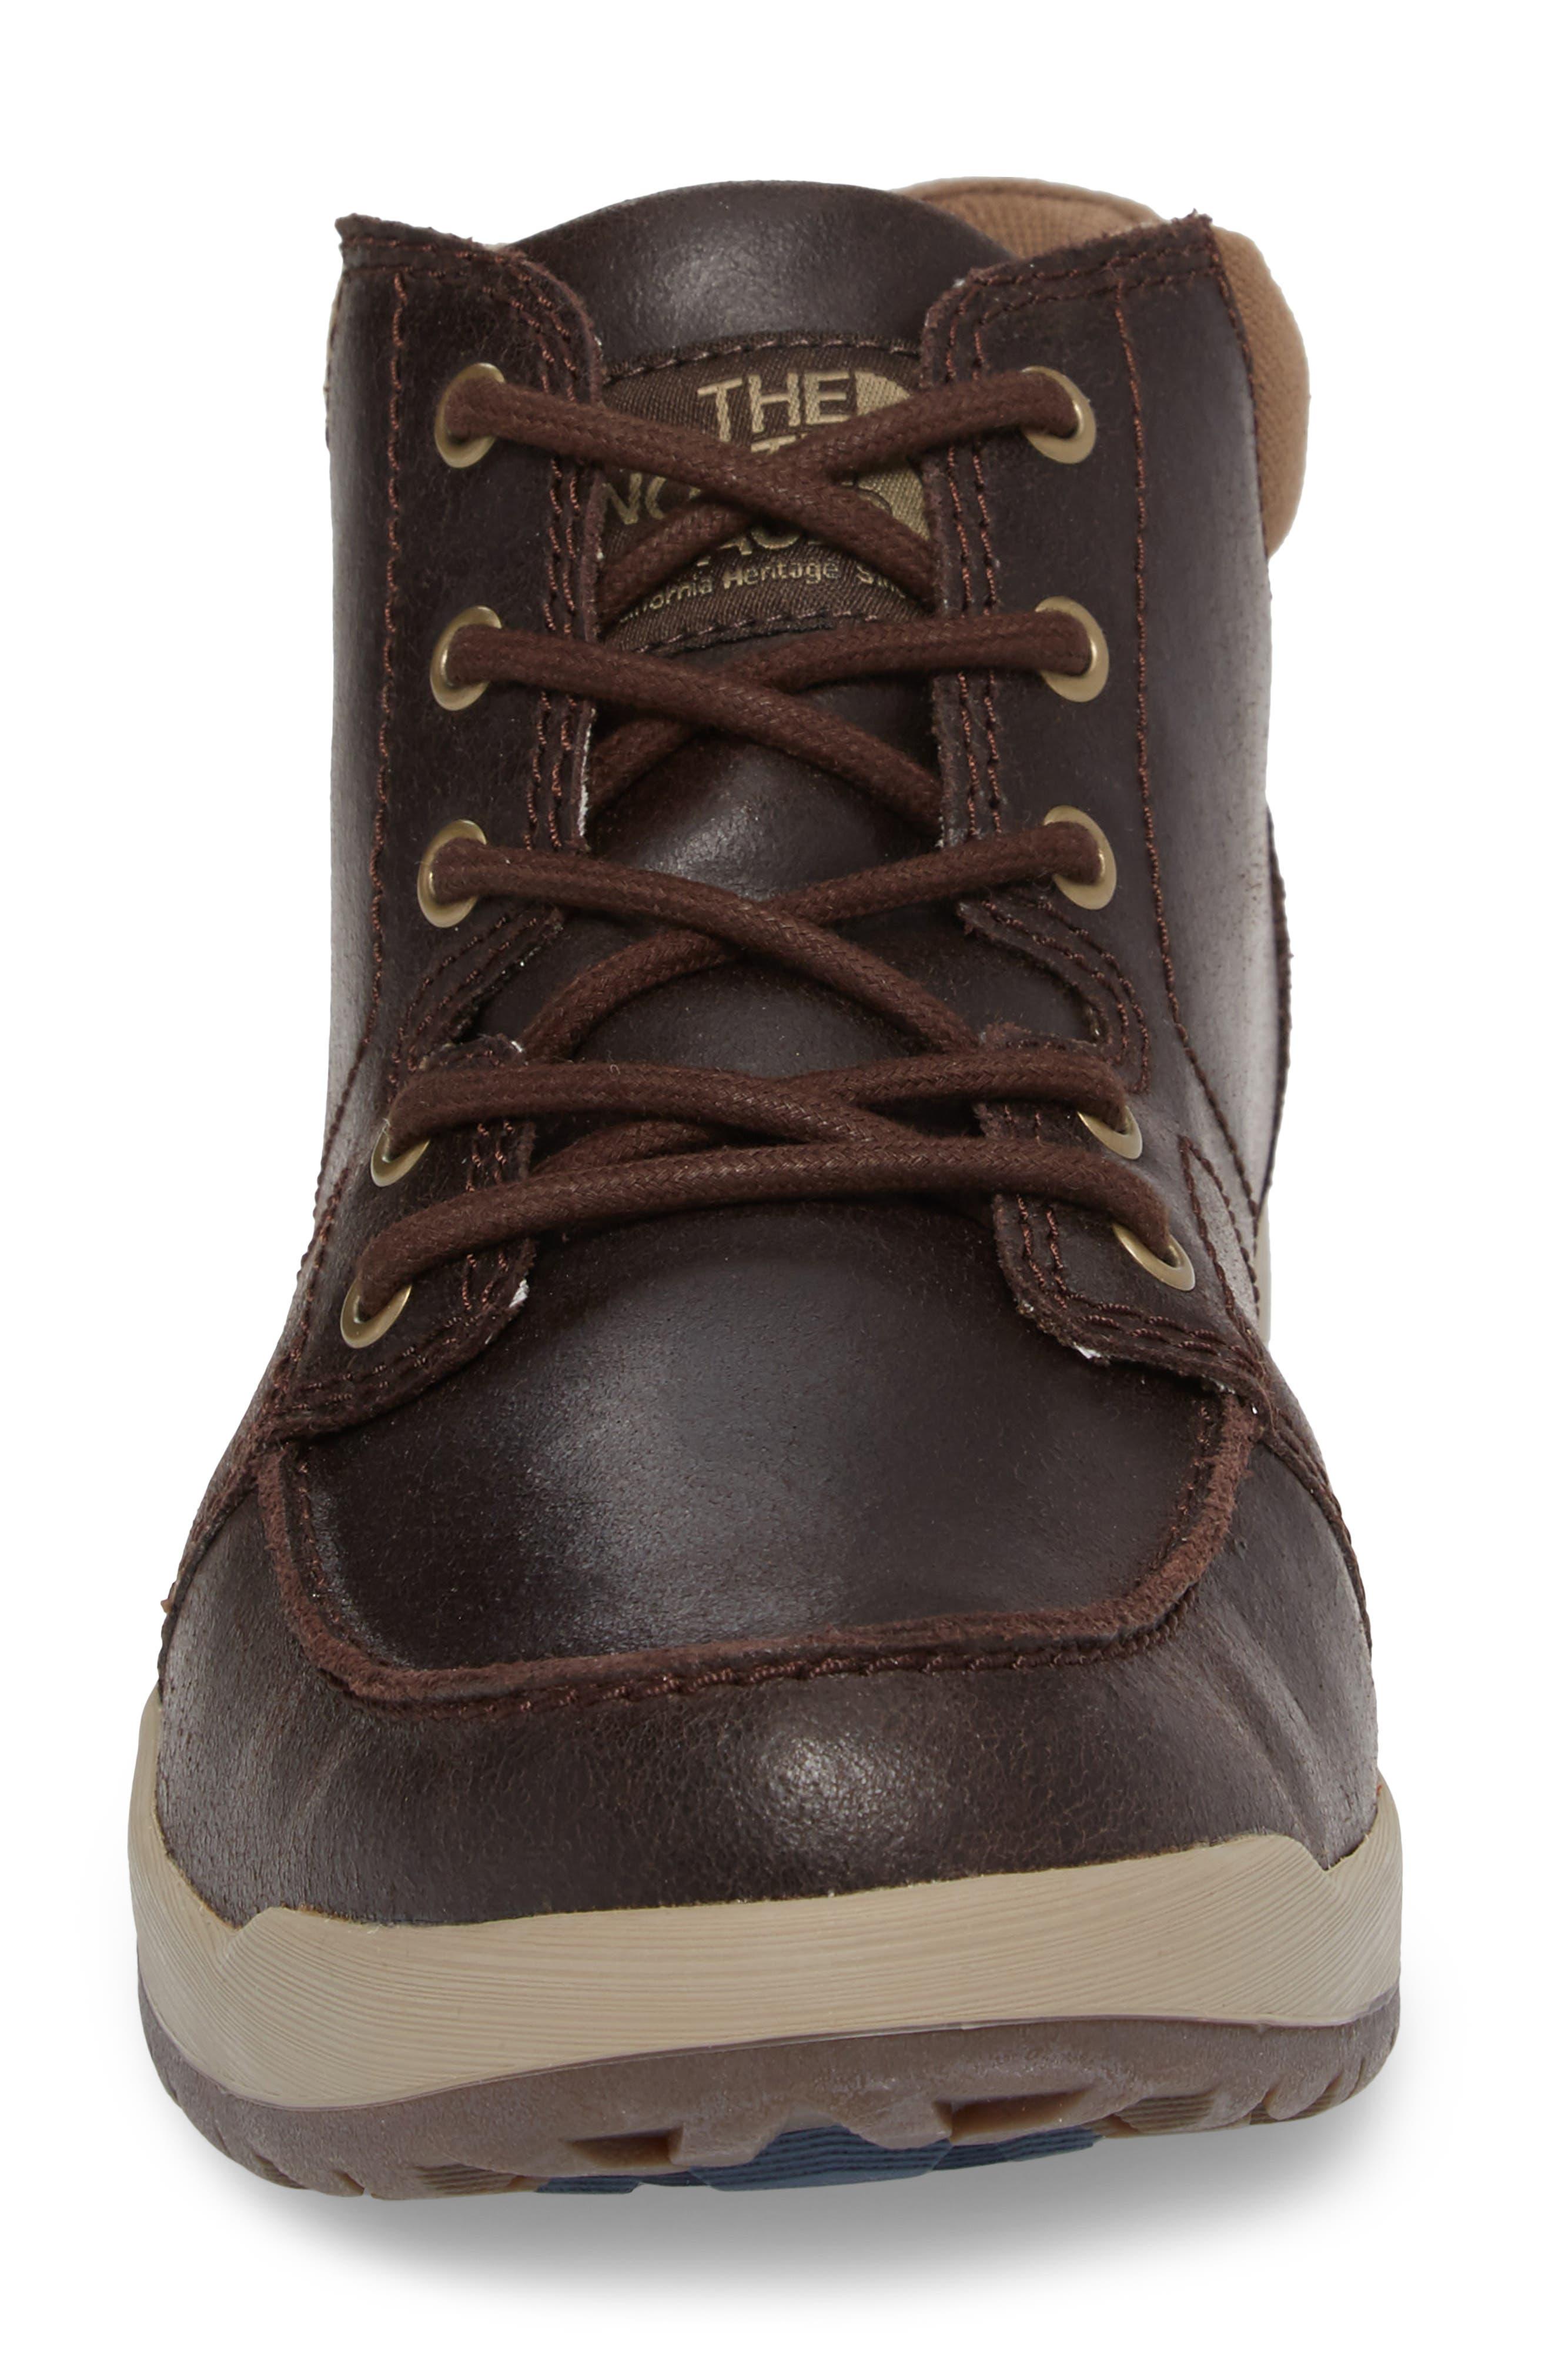 Ballard Evo Moc Toe Boot,                             Alternate thumbnail 4, color,                             210